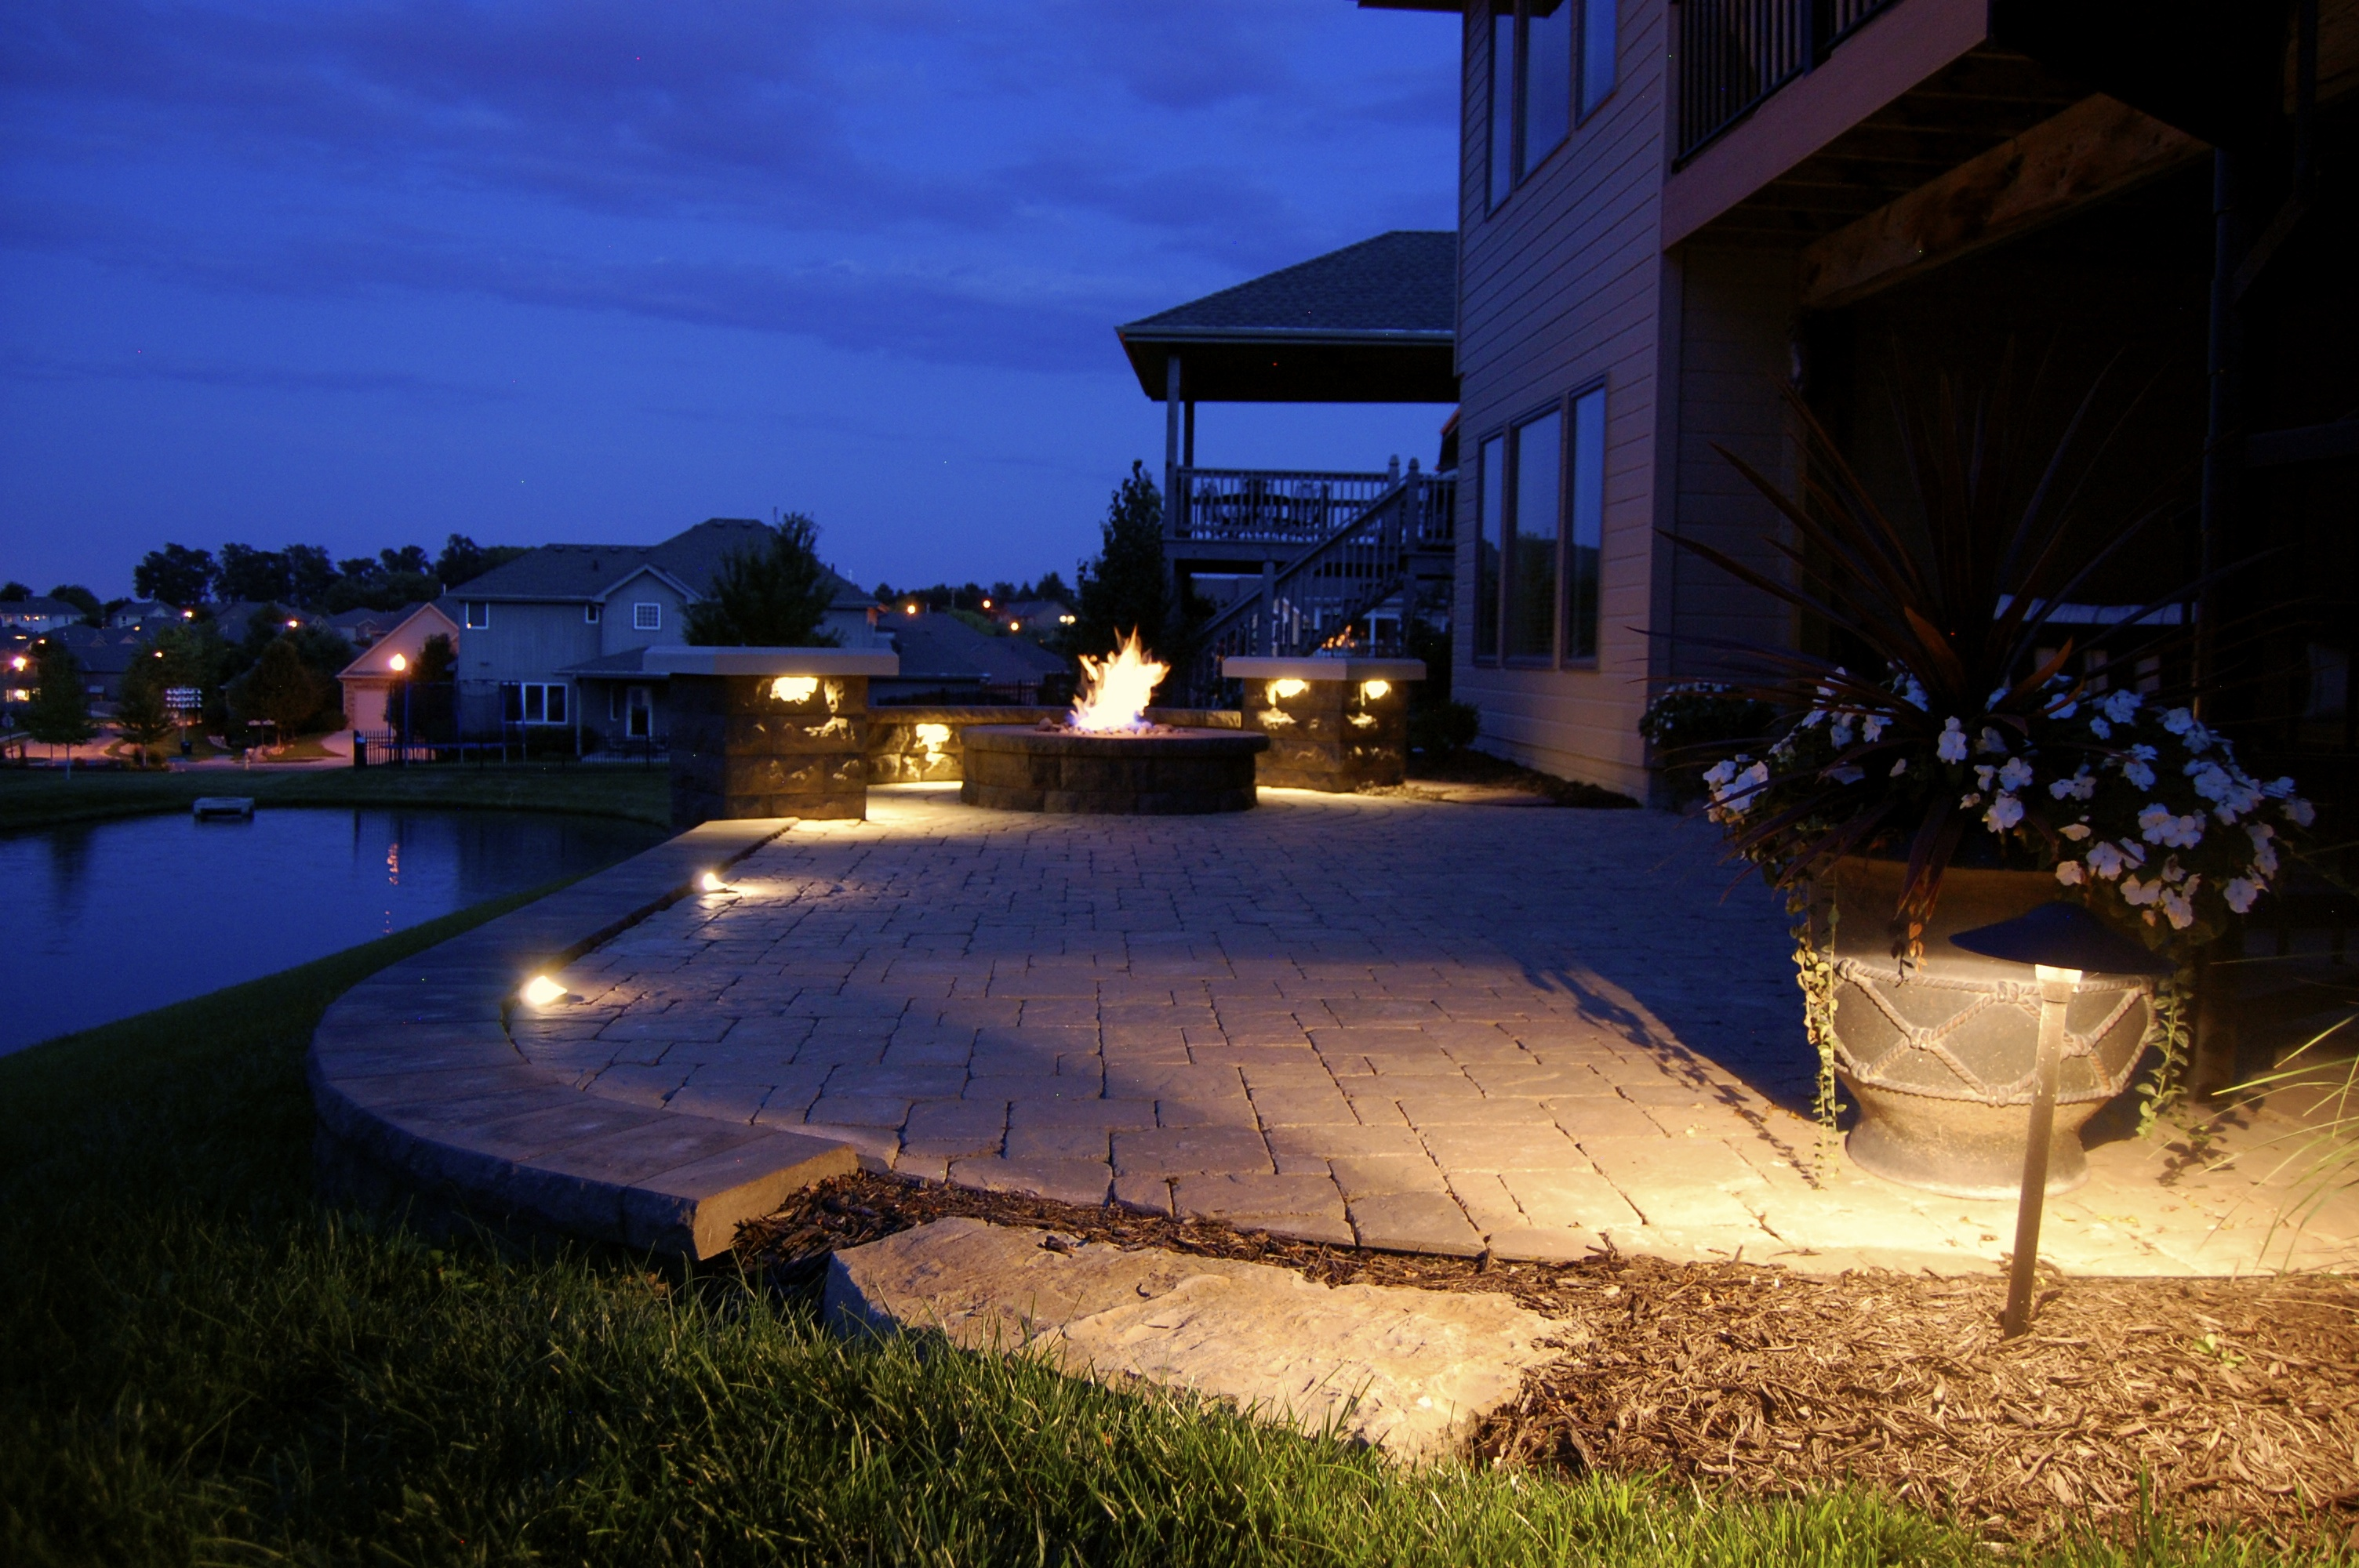 Omaha hardscaping,Omaha paver patios